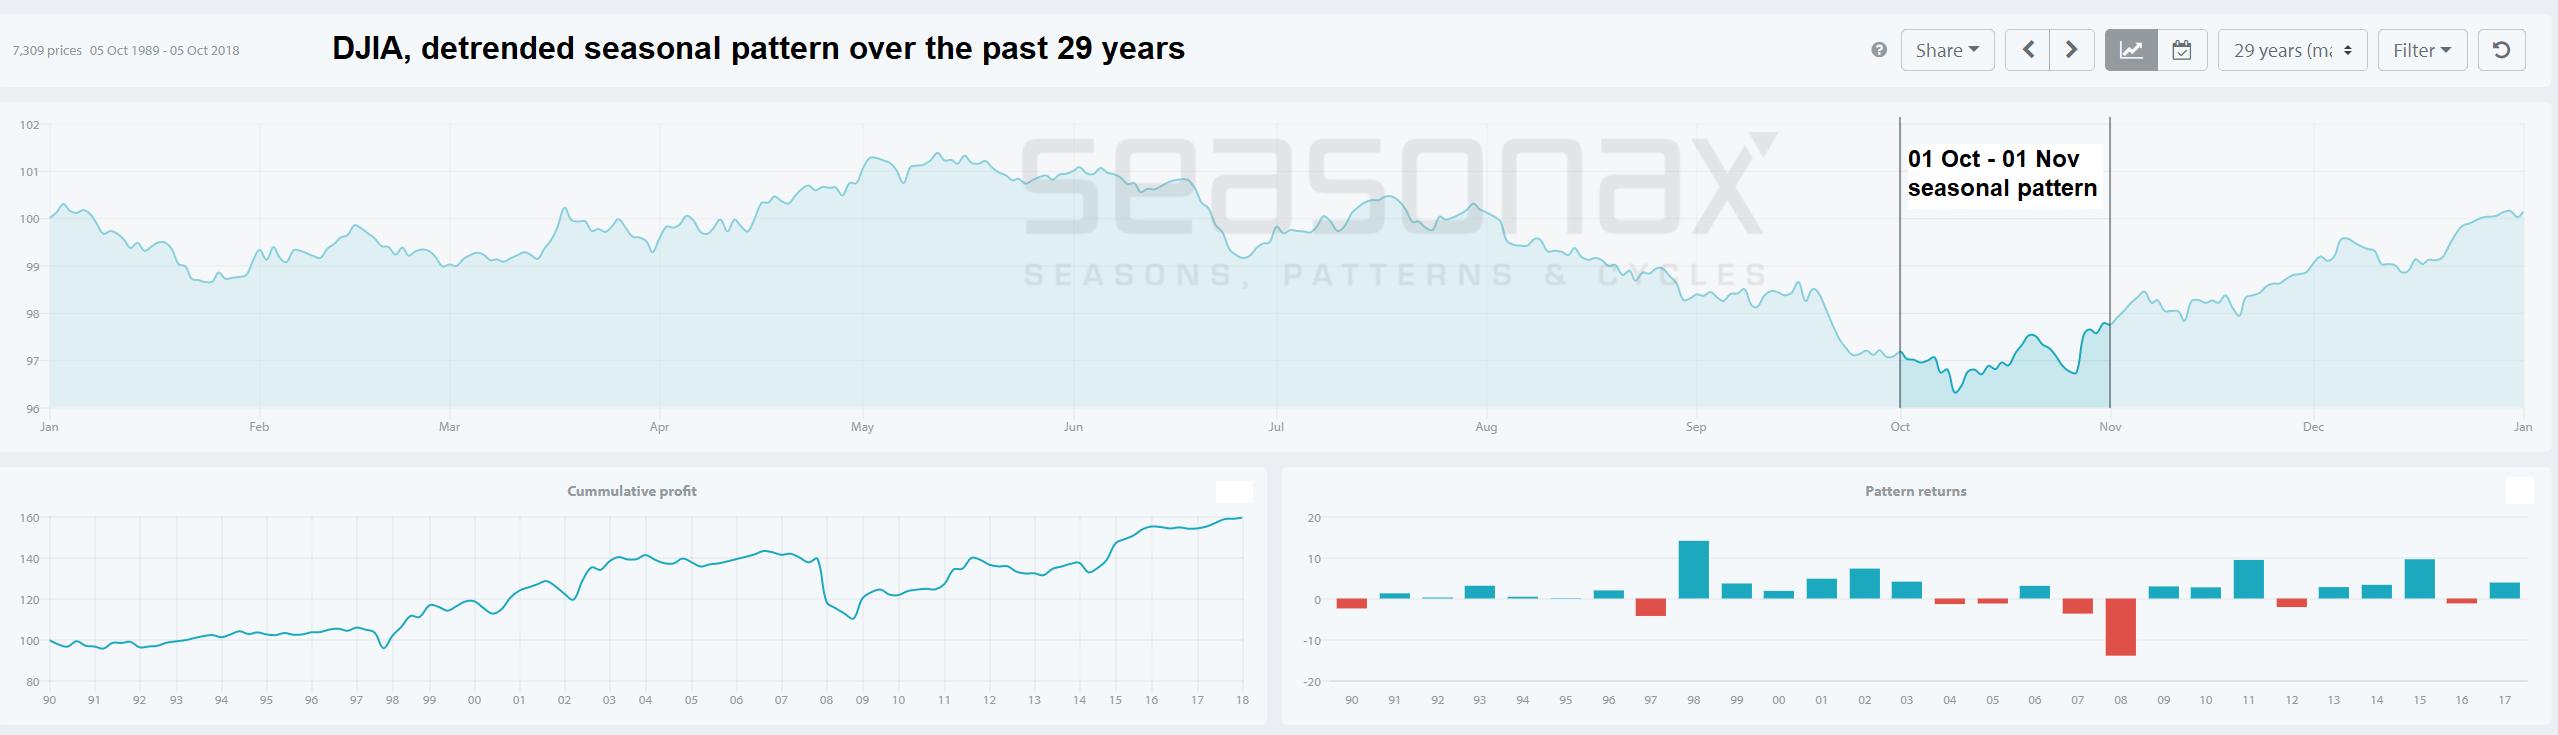 DJIA 29 year seasonal